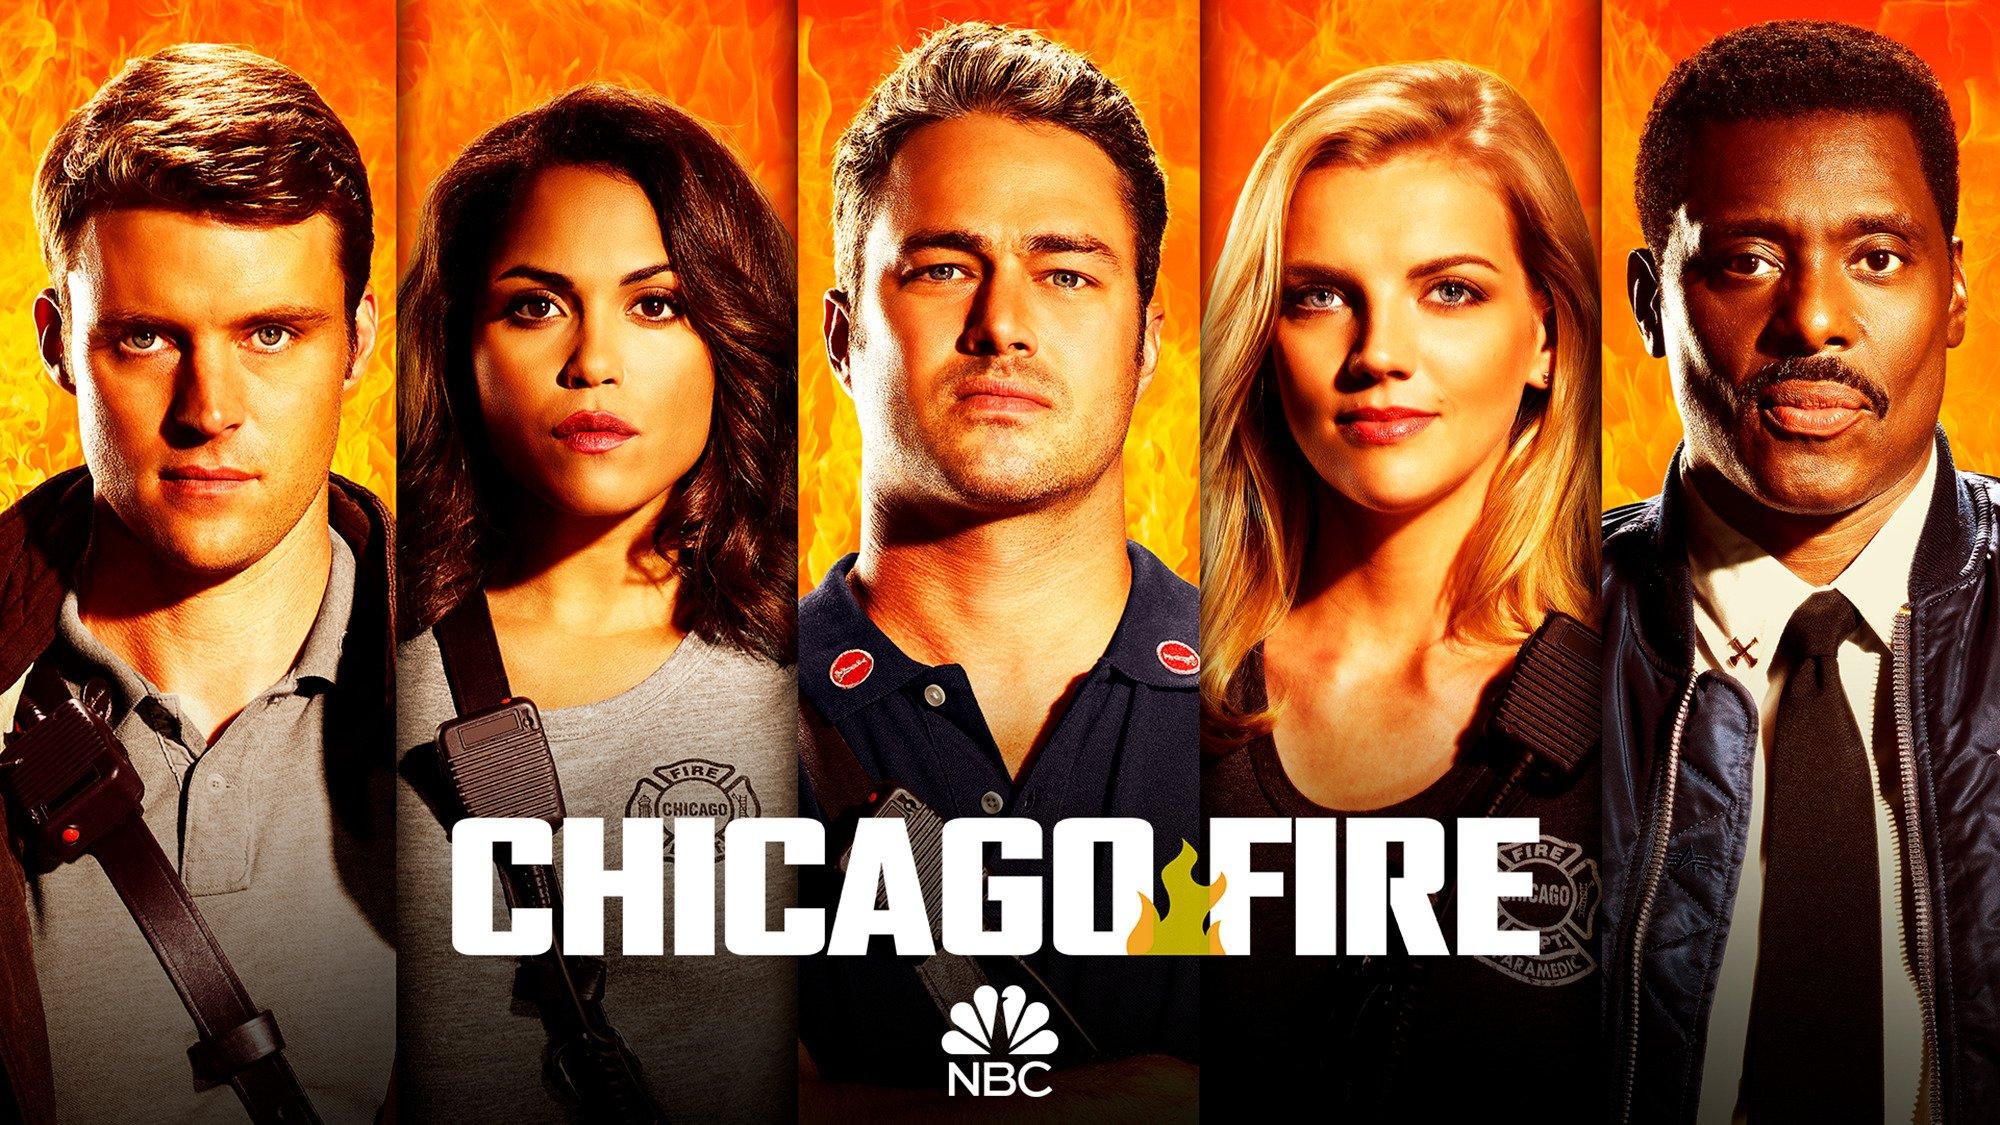 chicago fire season 3 episode 20 cast